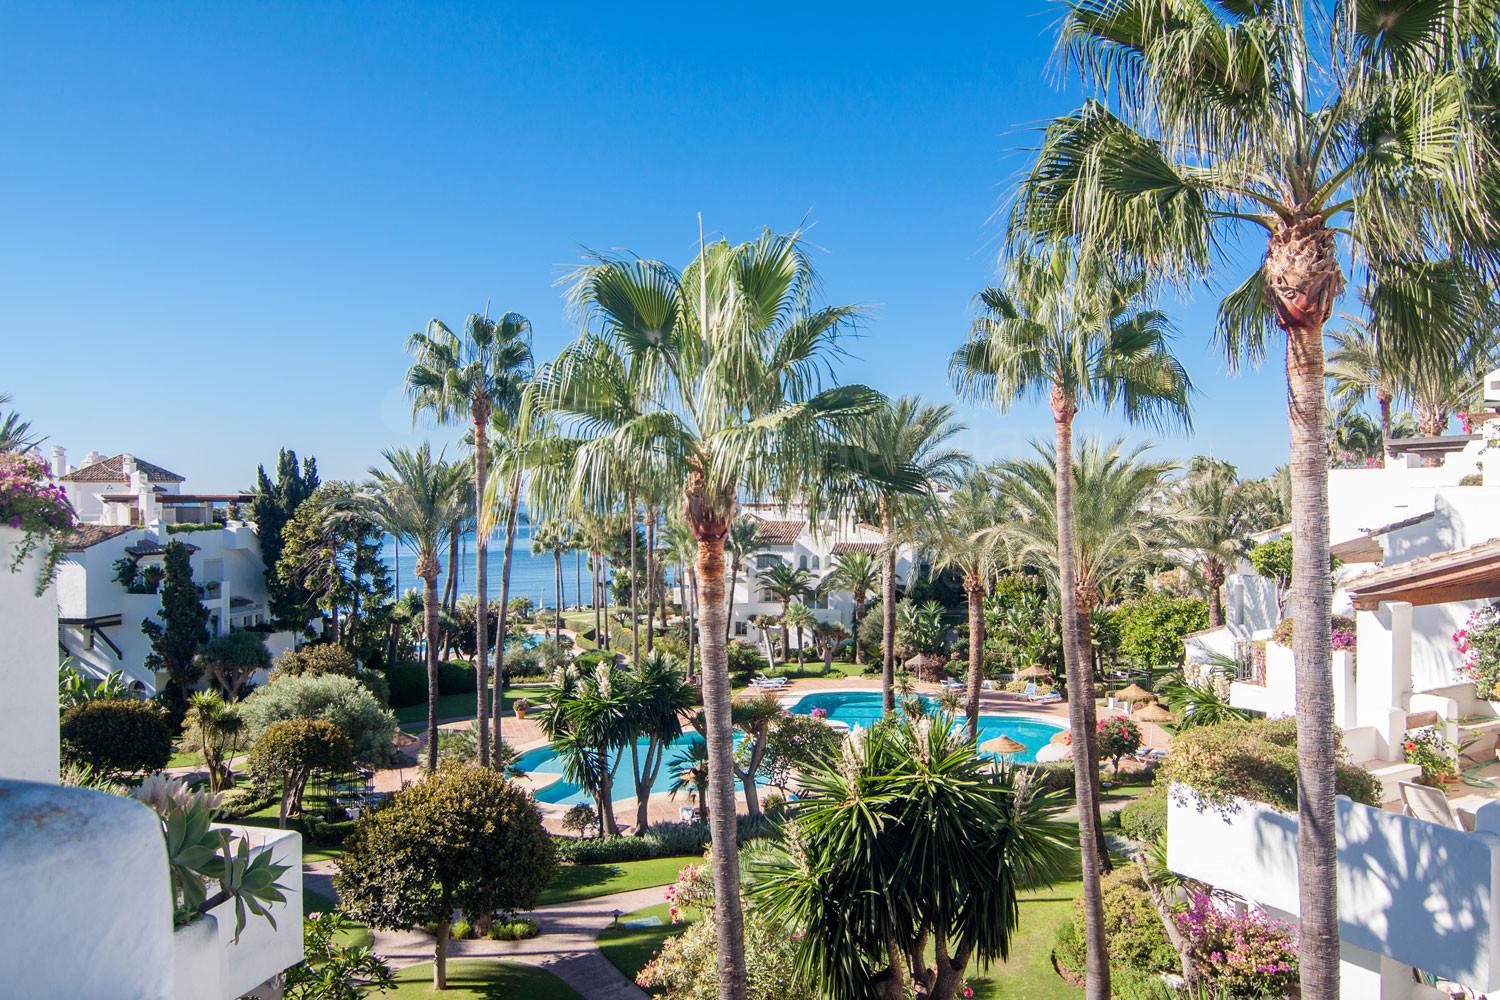 2-bedroom duplex penthouse apartment with sea views for sale in Alcazaba Beach, Estepona